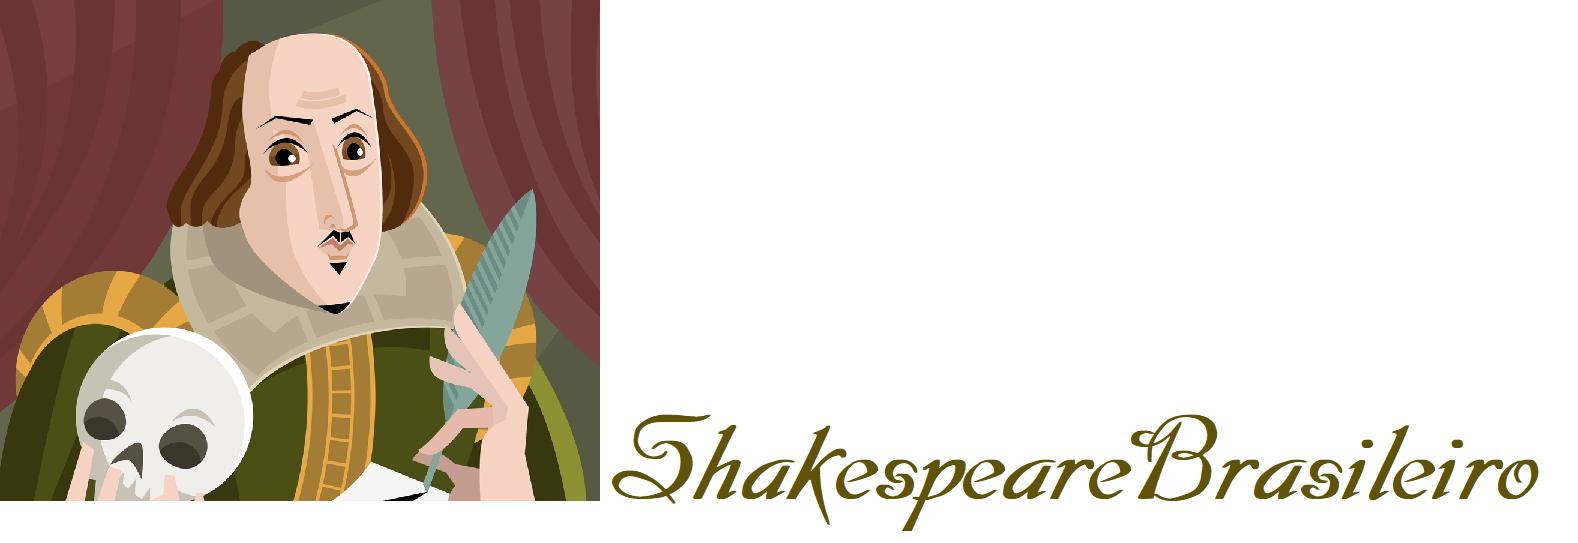 ShakespeareBrasileiro